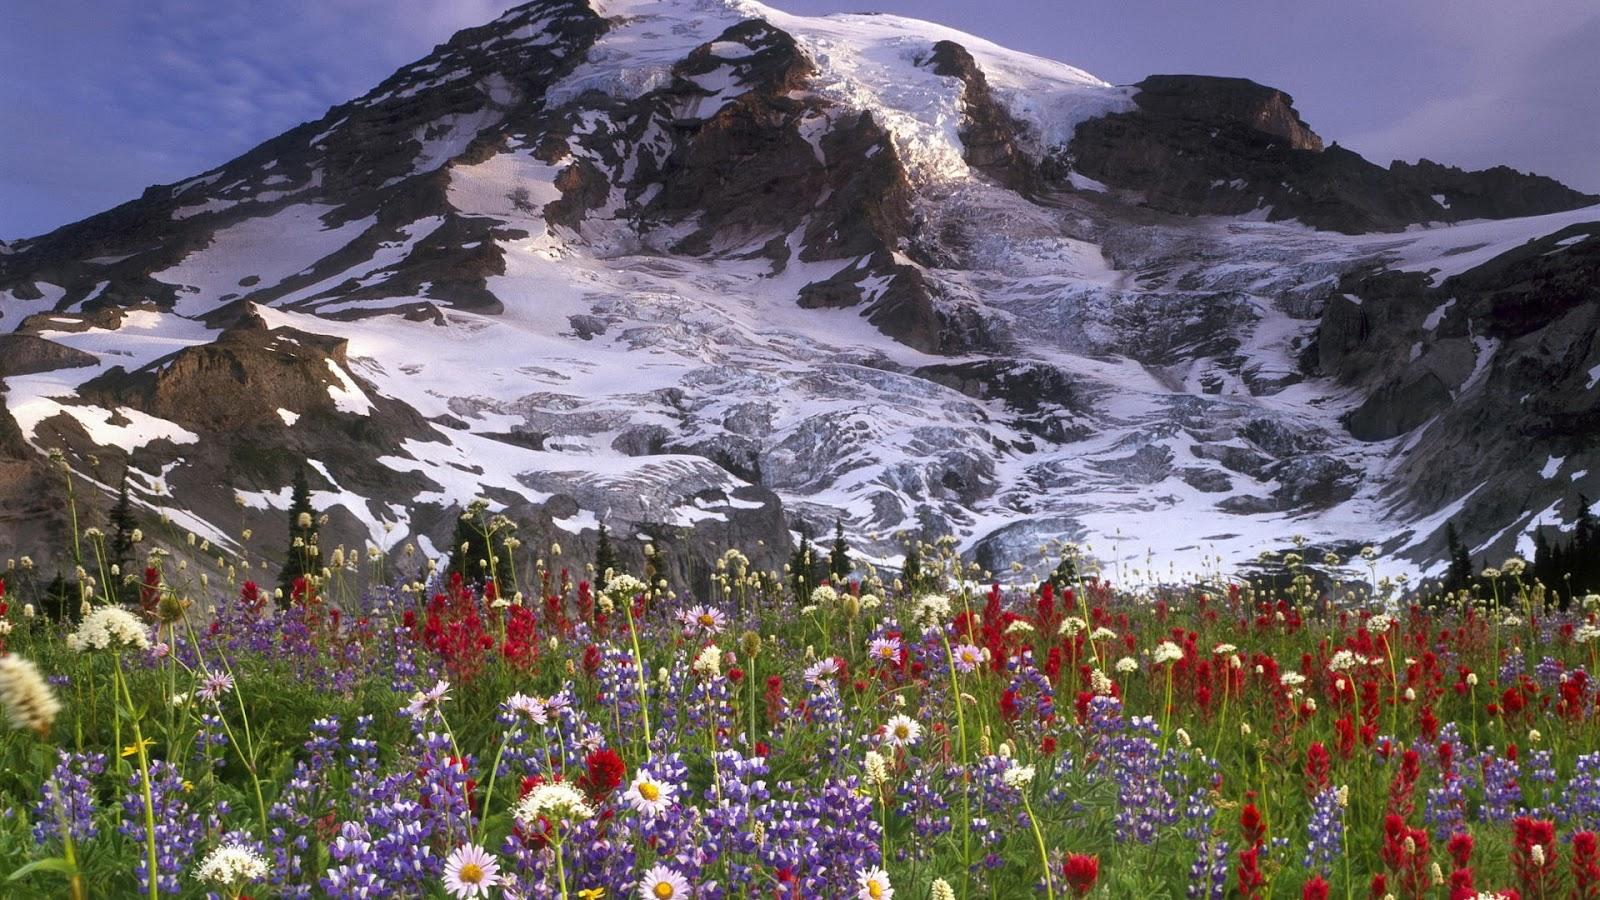 Wallpaper Proslut Full Size Ice Mountains Forest Hd